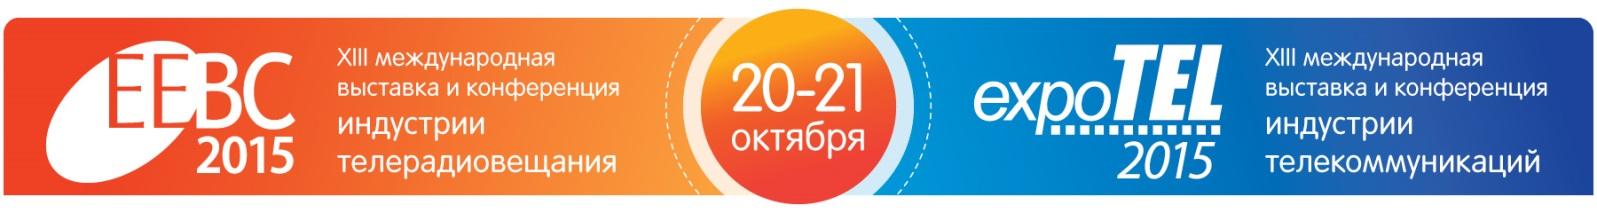 EEBC-expoTel-2015